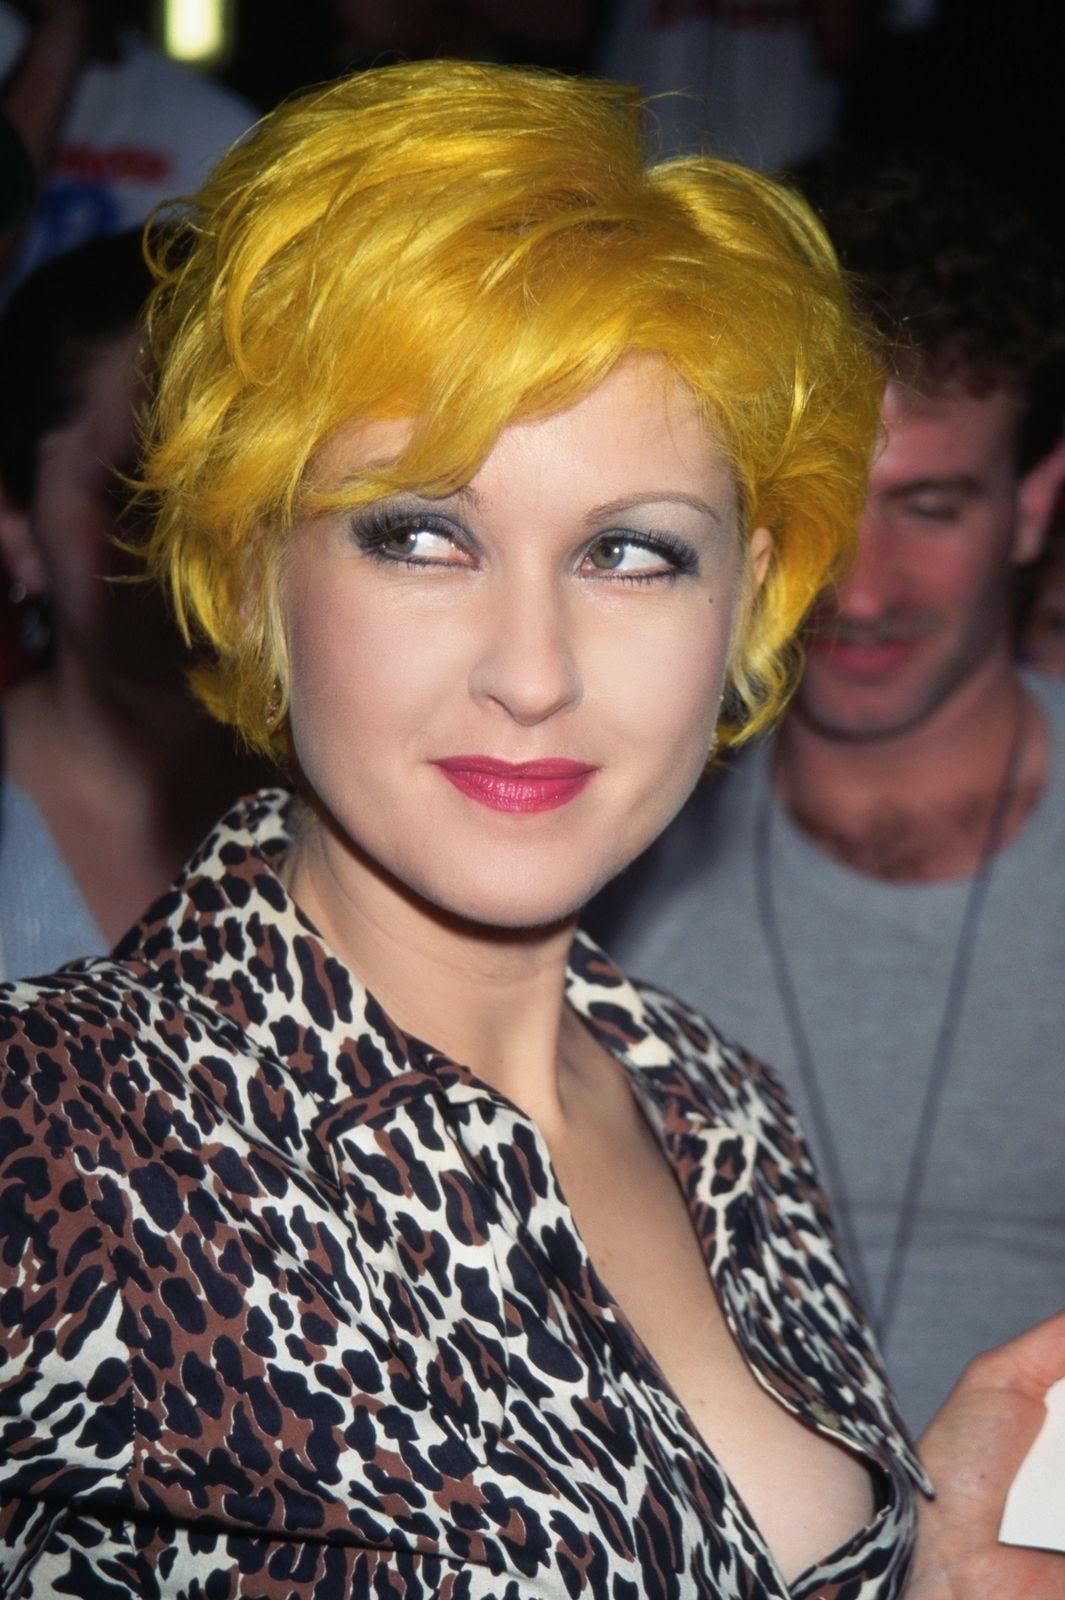 Cyndi Lauper S Fun Ct Colonial Is This Week S Most Popular: Actress In Bikini: April 2014